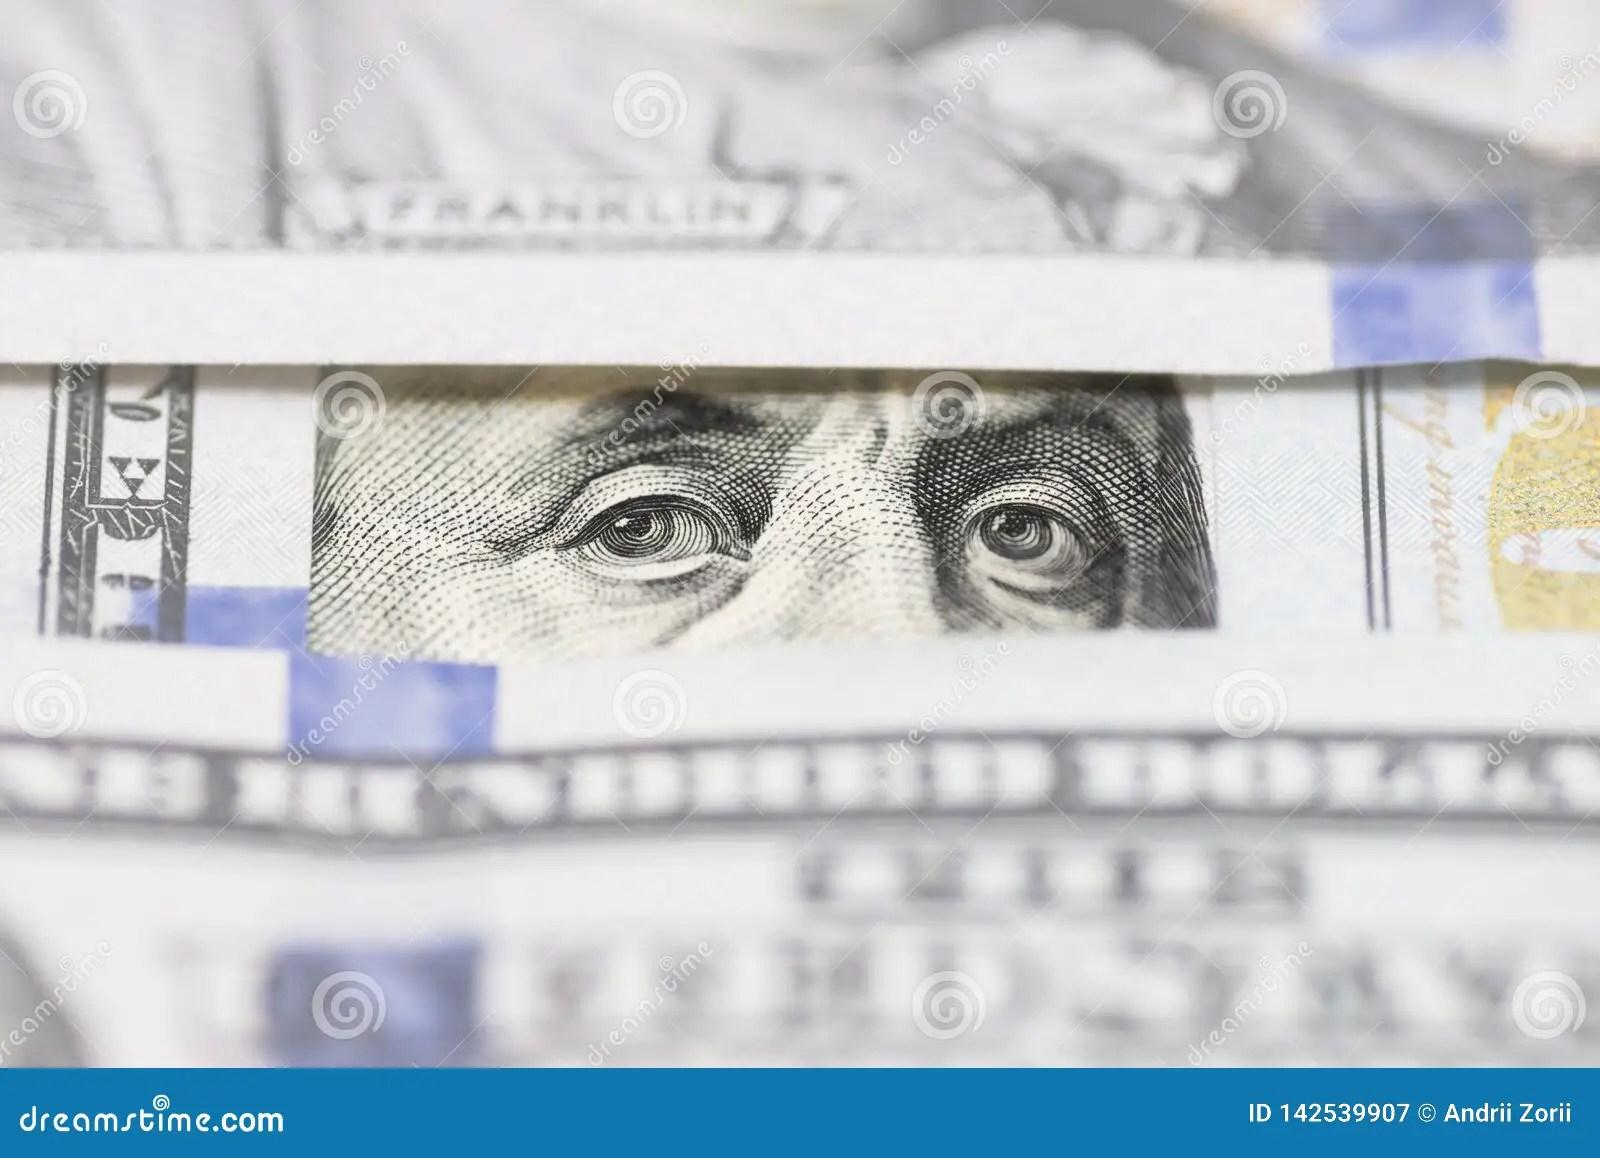 Benjamin Franklin S Eyes Between Hundred Dollar Banknotes